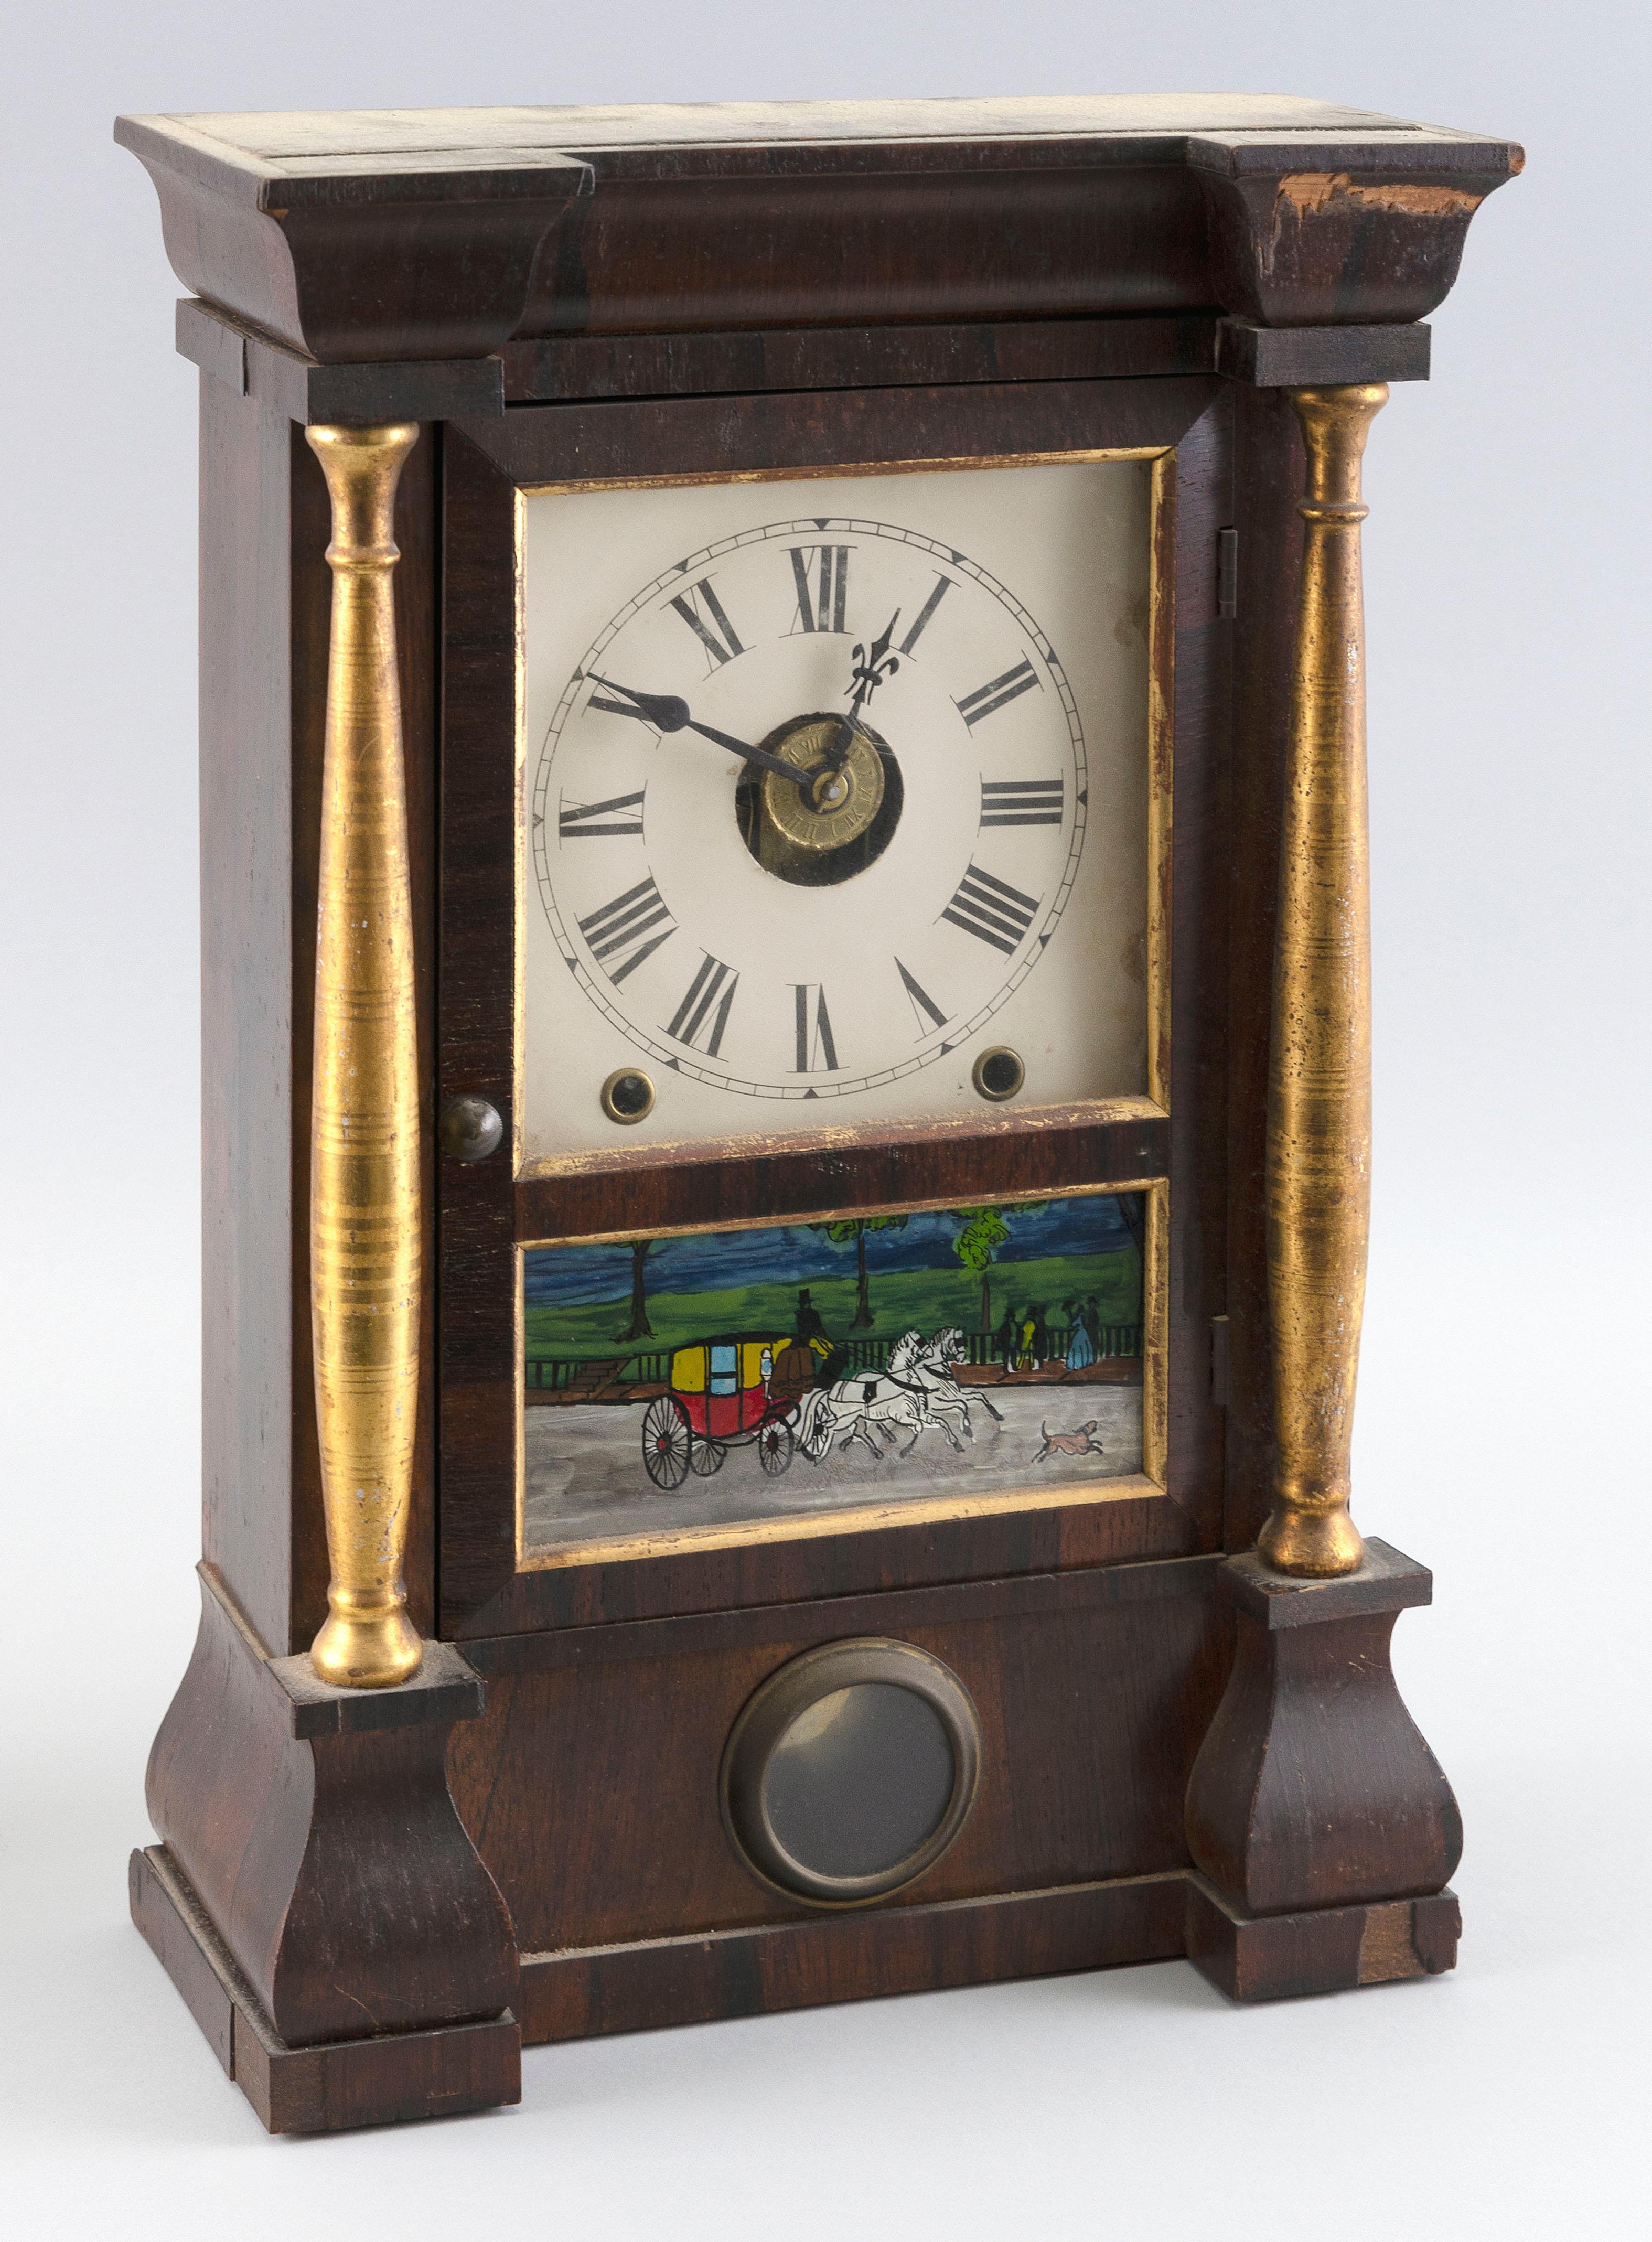 "SETH THOMAS HALF-SIZE PILLAR CLOCK 19th Century Height 16"". Width 10.5"". Depth 5""."